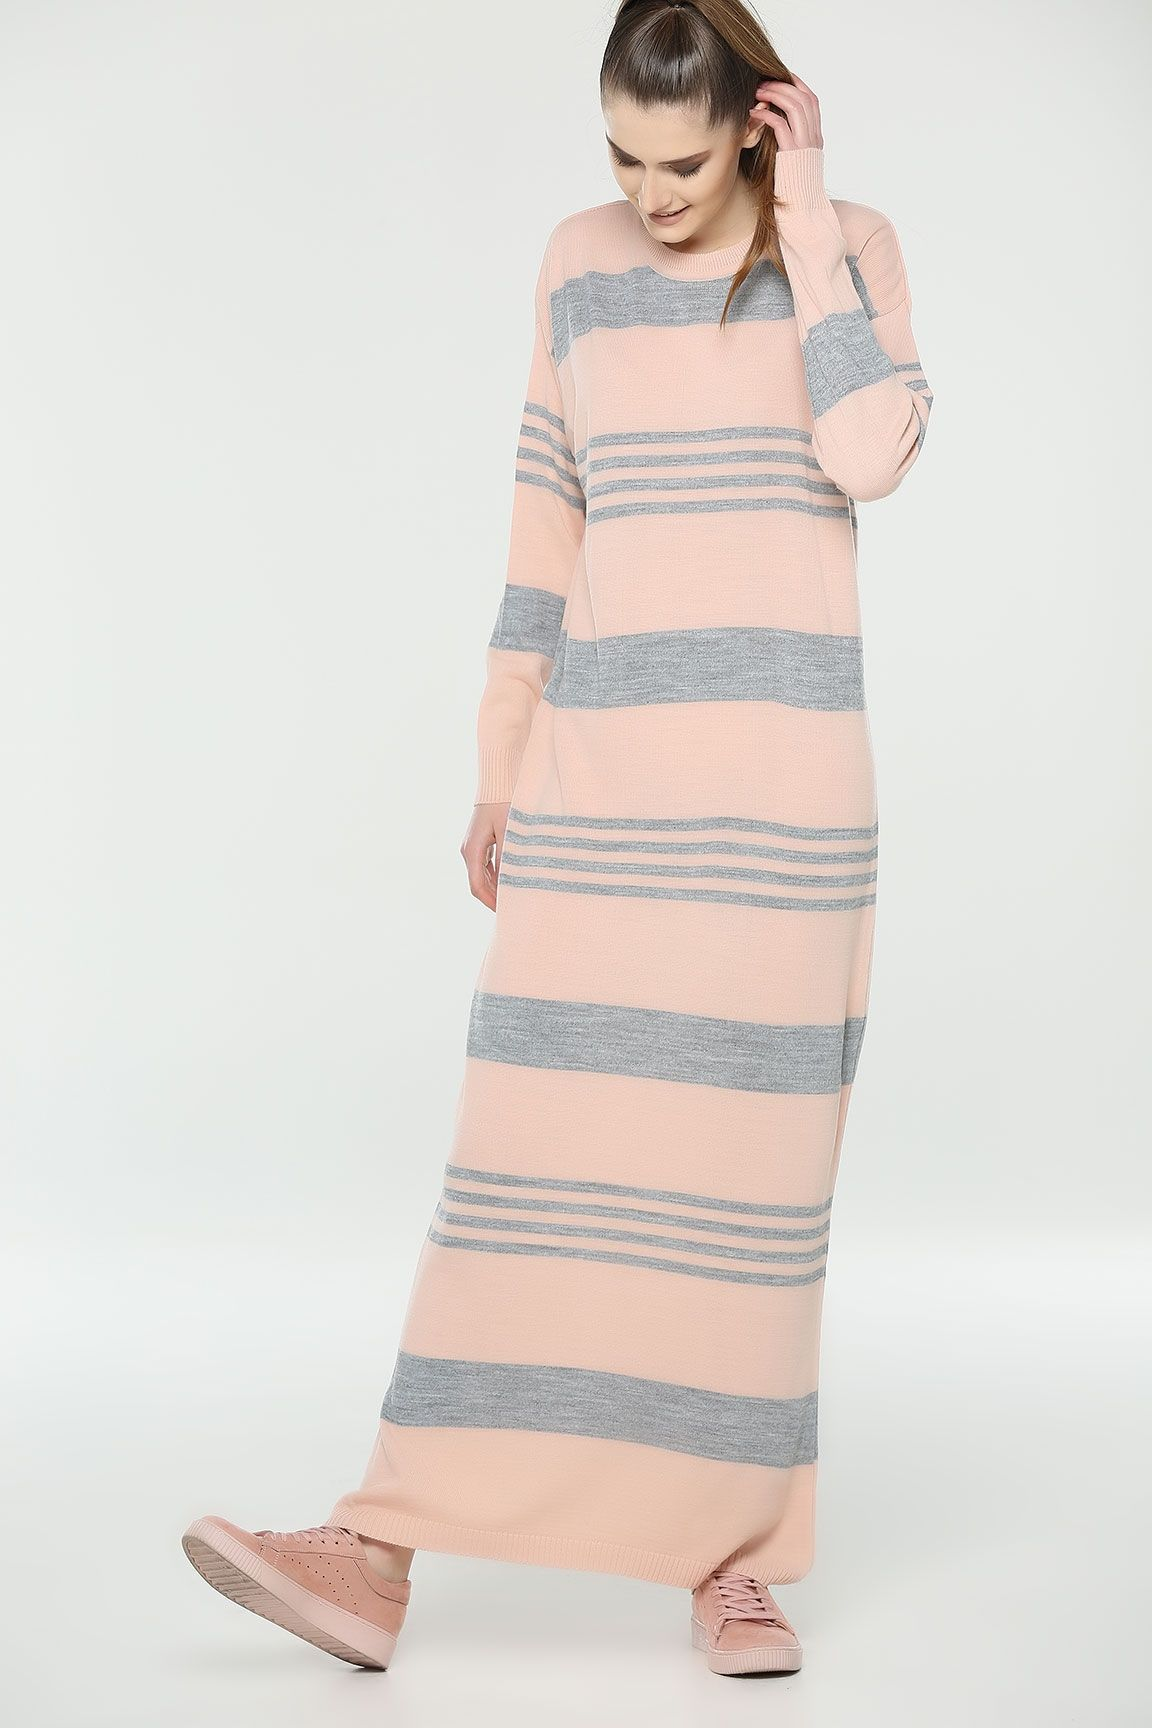 Pudra Cizgili Triko Elbise Elbise Triko Giyim